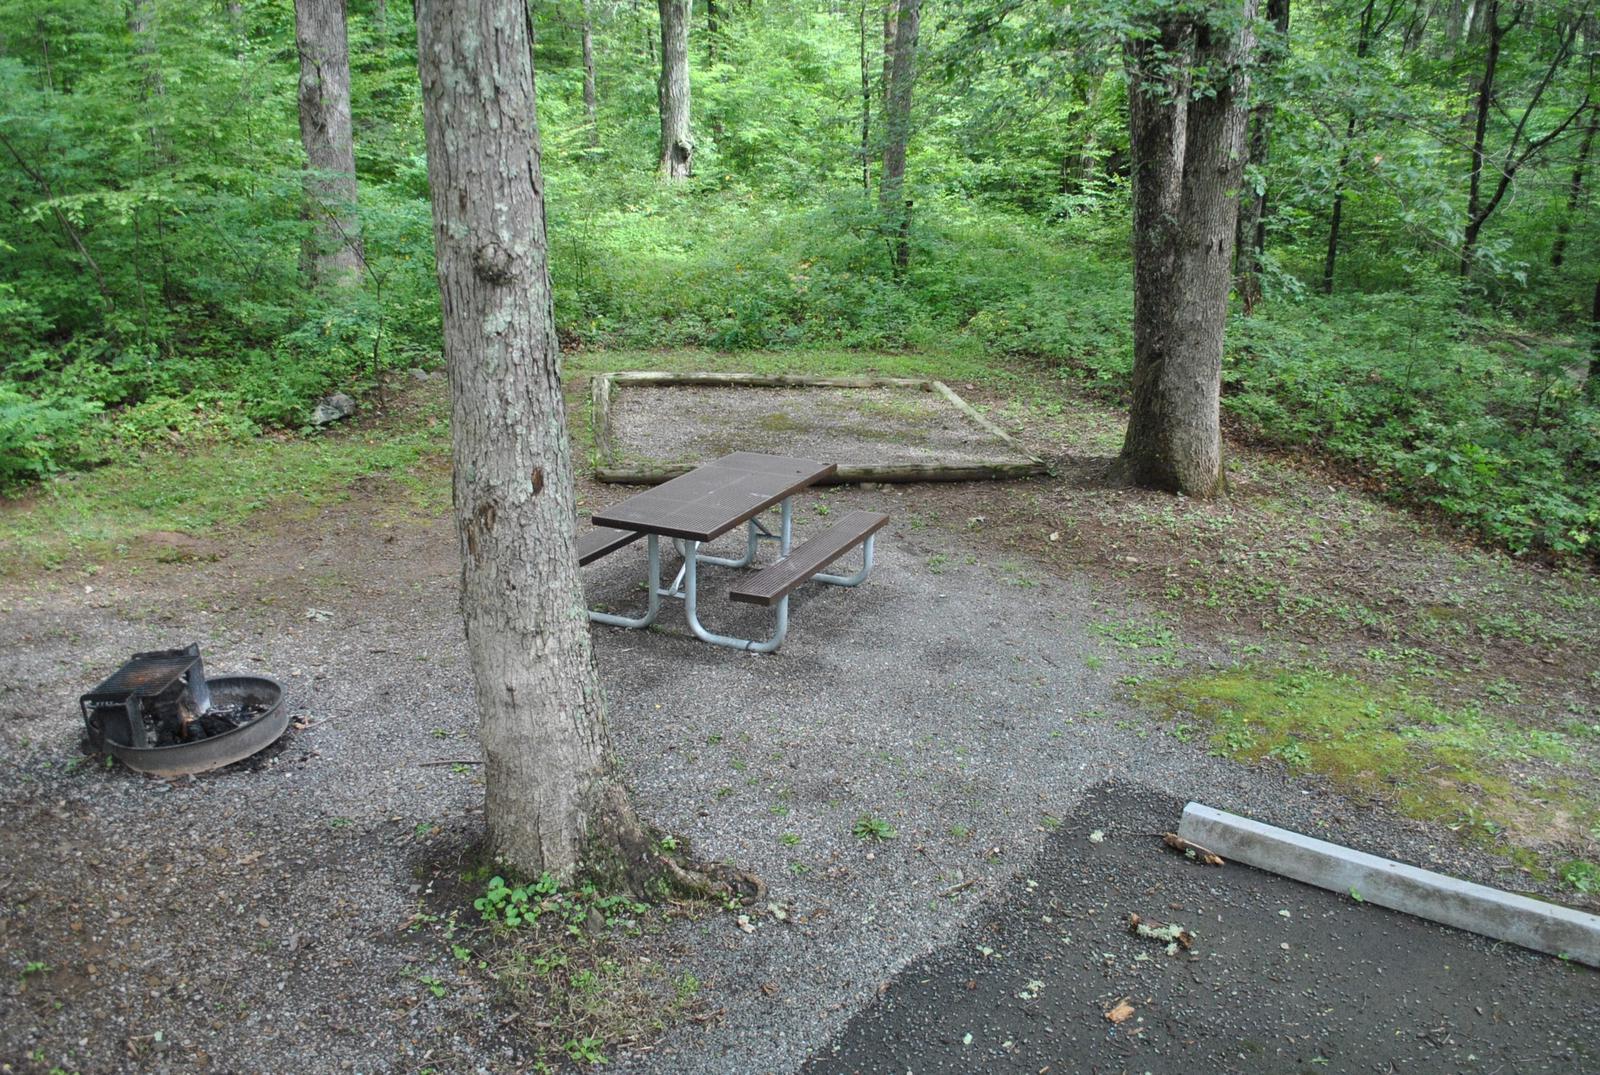 Mathews Arm Campground – Site A020